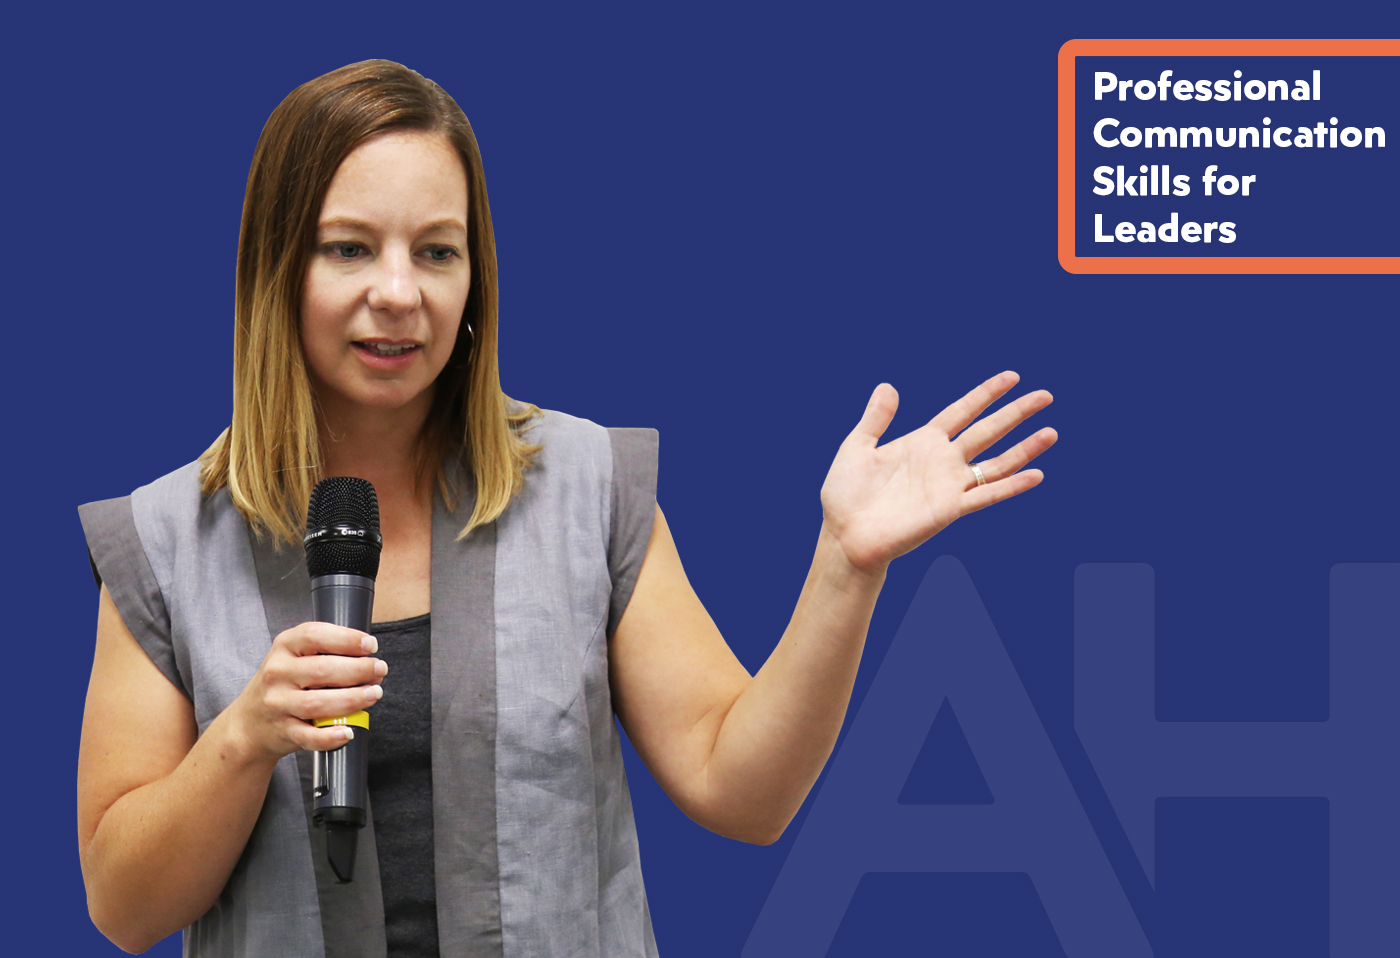 7 Professional Communication Skills for Leaders.jpg